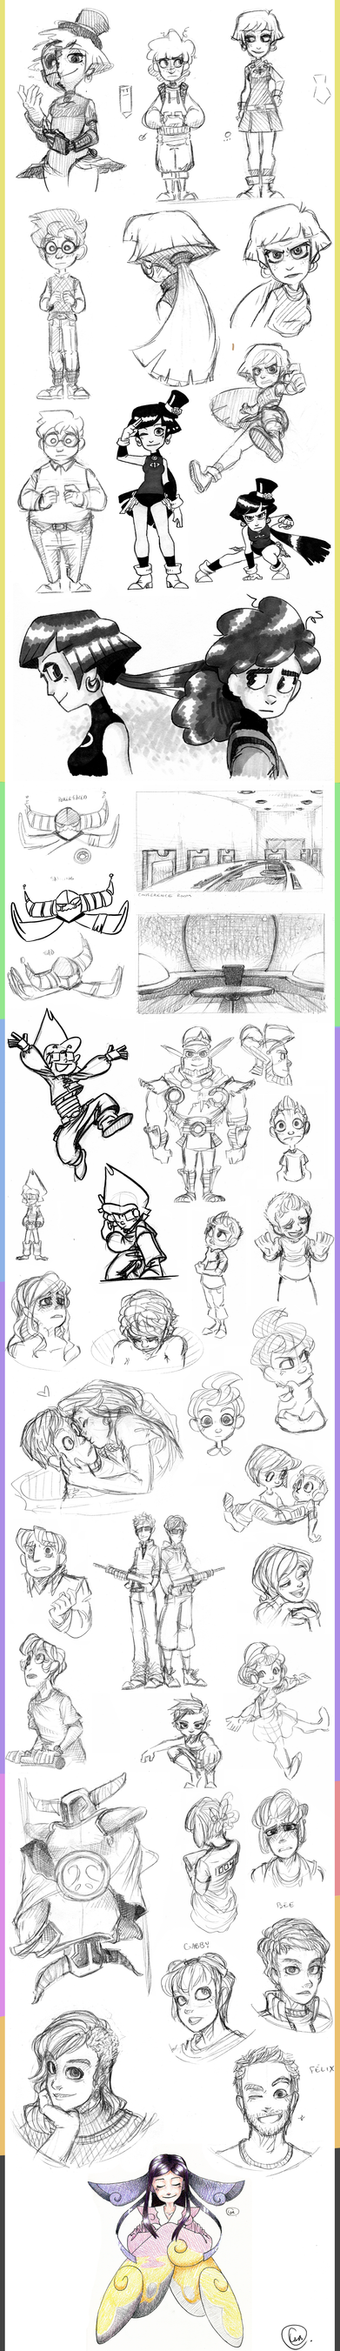 Sketch Dump 7 by CPTBee